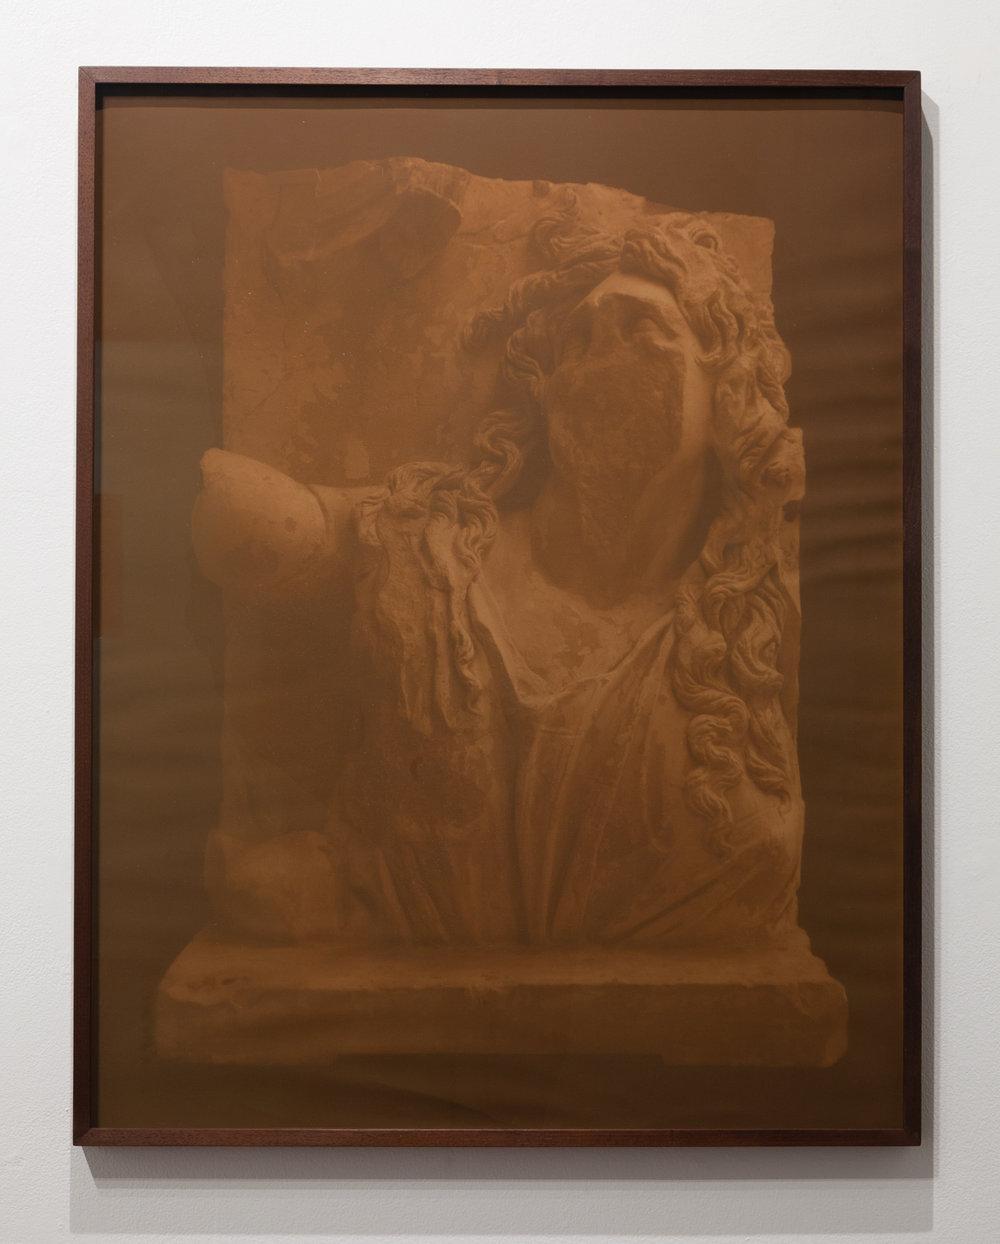 CHRISTINE ELFMAN  Ge , 2017 Anthotype (tiger lily dye on paper) 39 x 30.5 in Edition varée 1/2 + 1AP